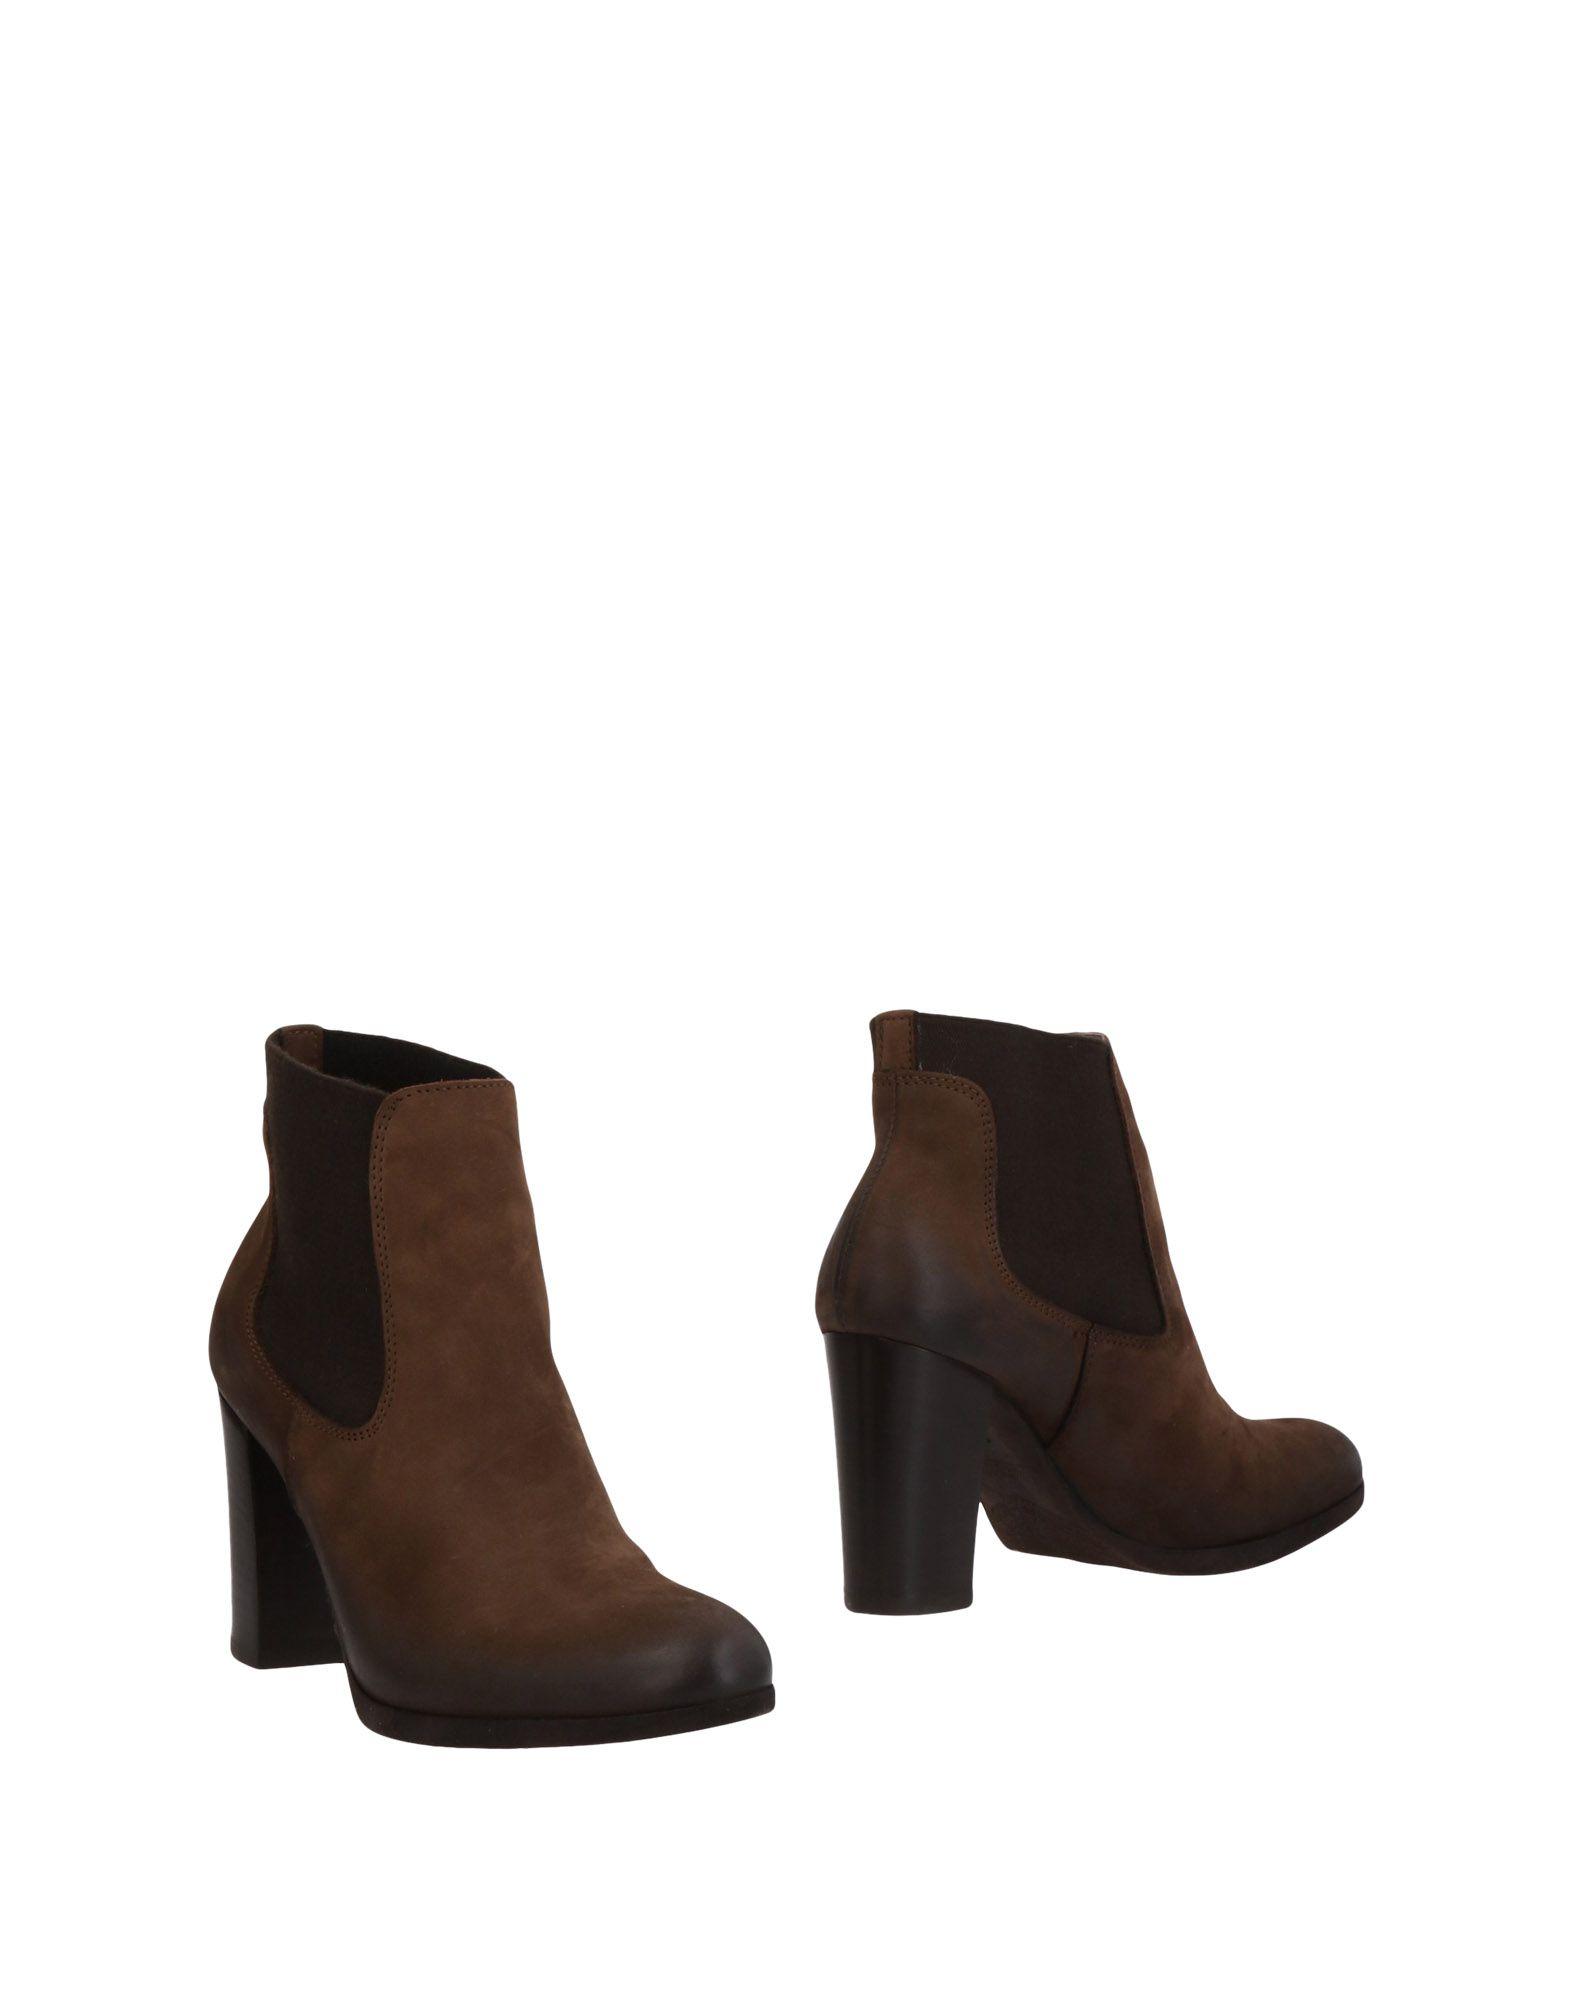 Manì Per Donna Più Chelsea Boots Damen  11464713DJ Gute Qualität beliebte Schuhe